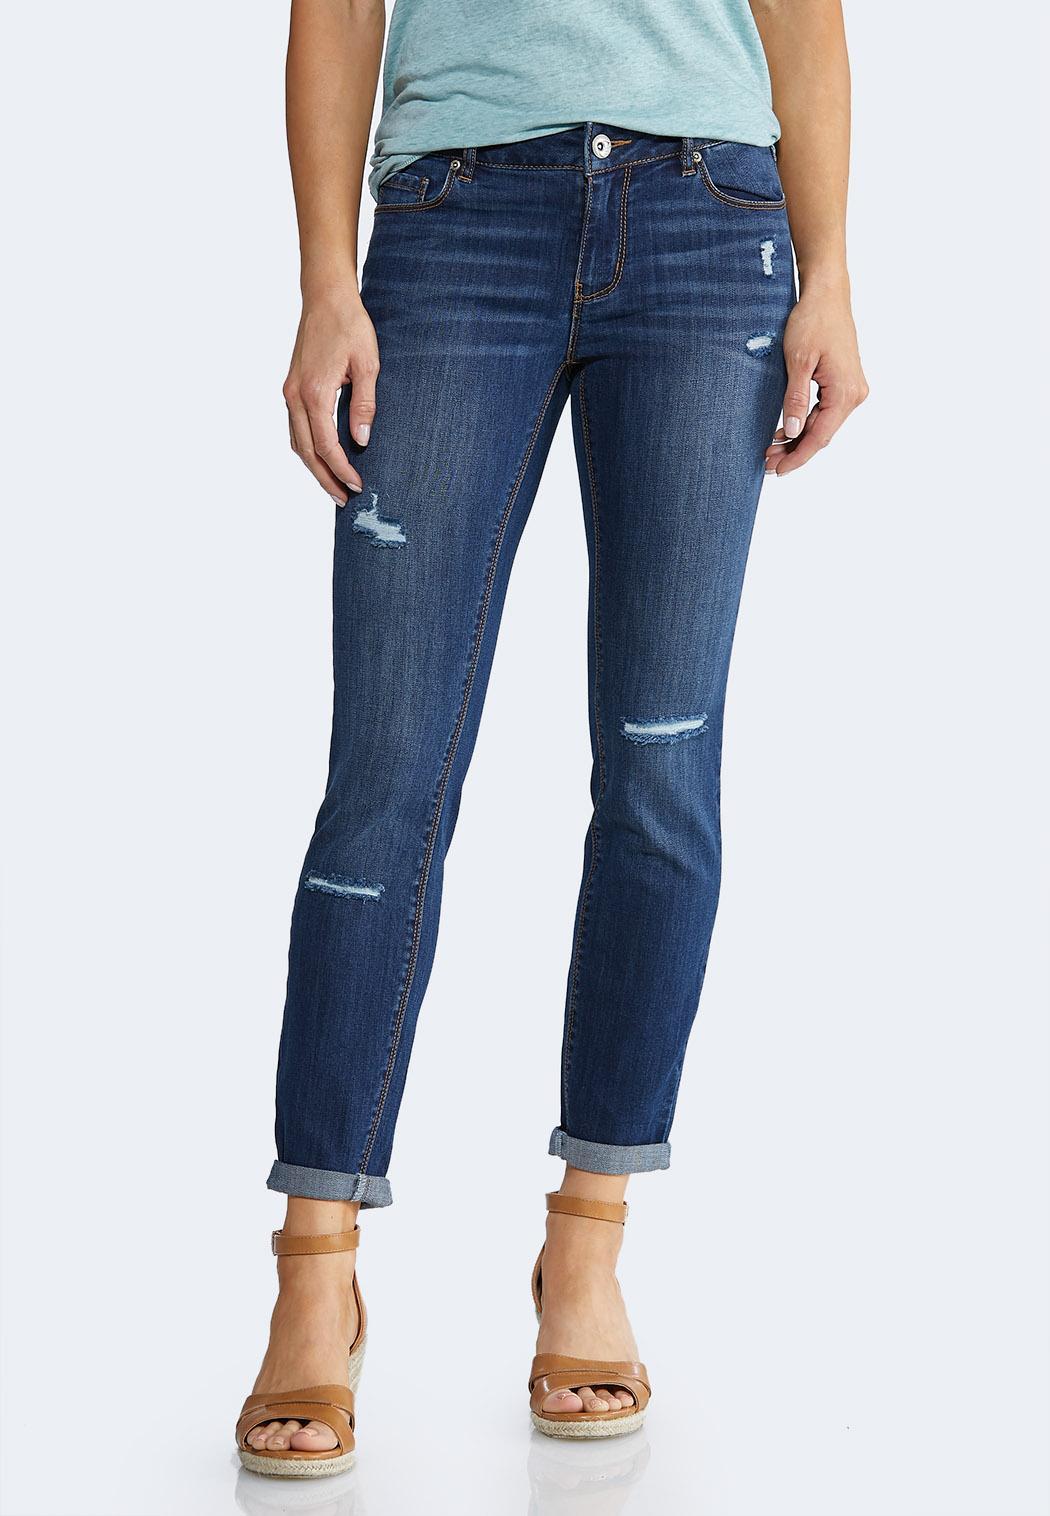 e7720c6e45c42 Dark Distressed Jeans alternate view · Dark Distressed Jeans